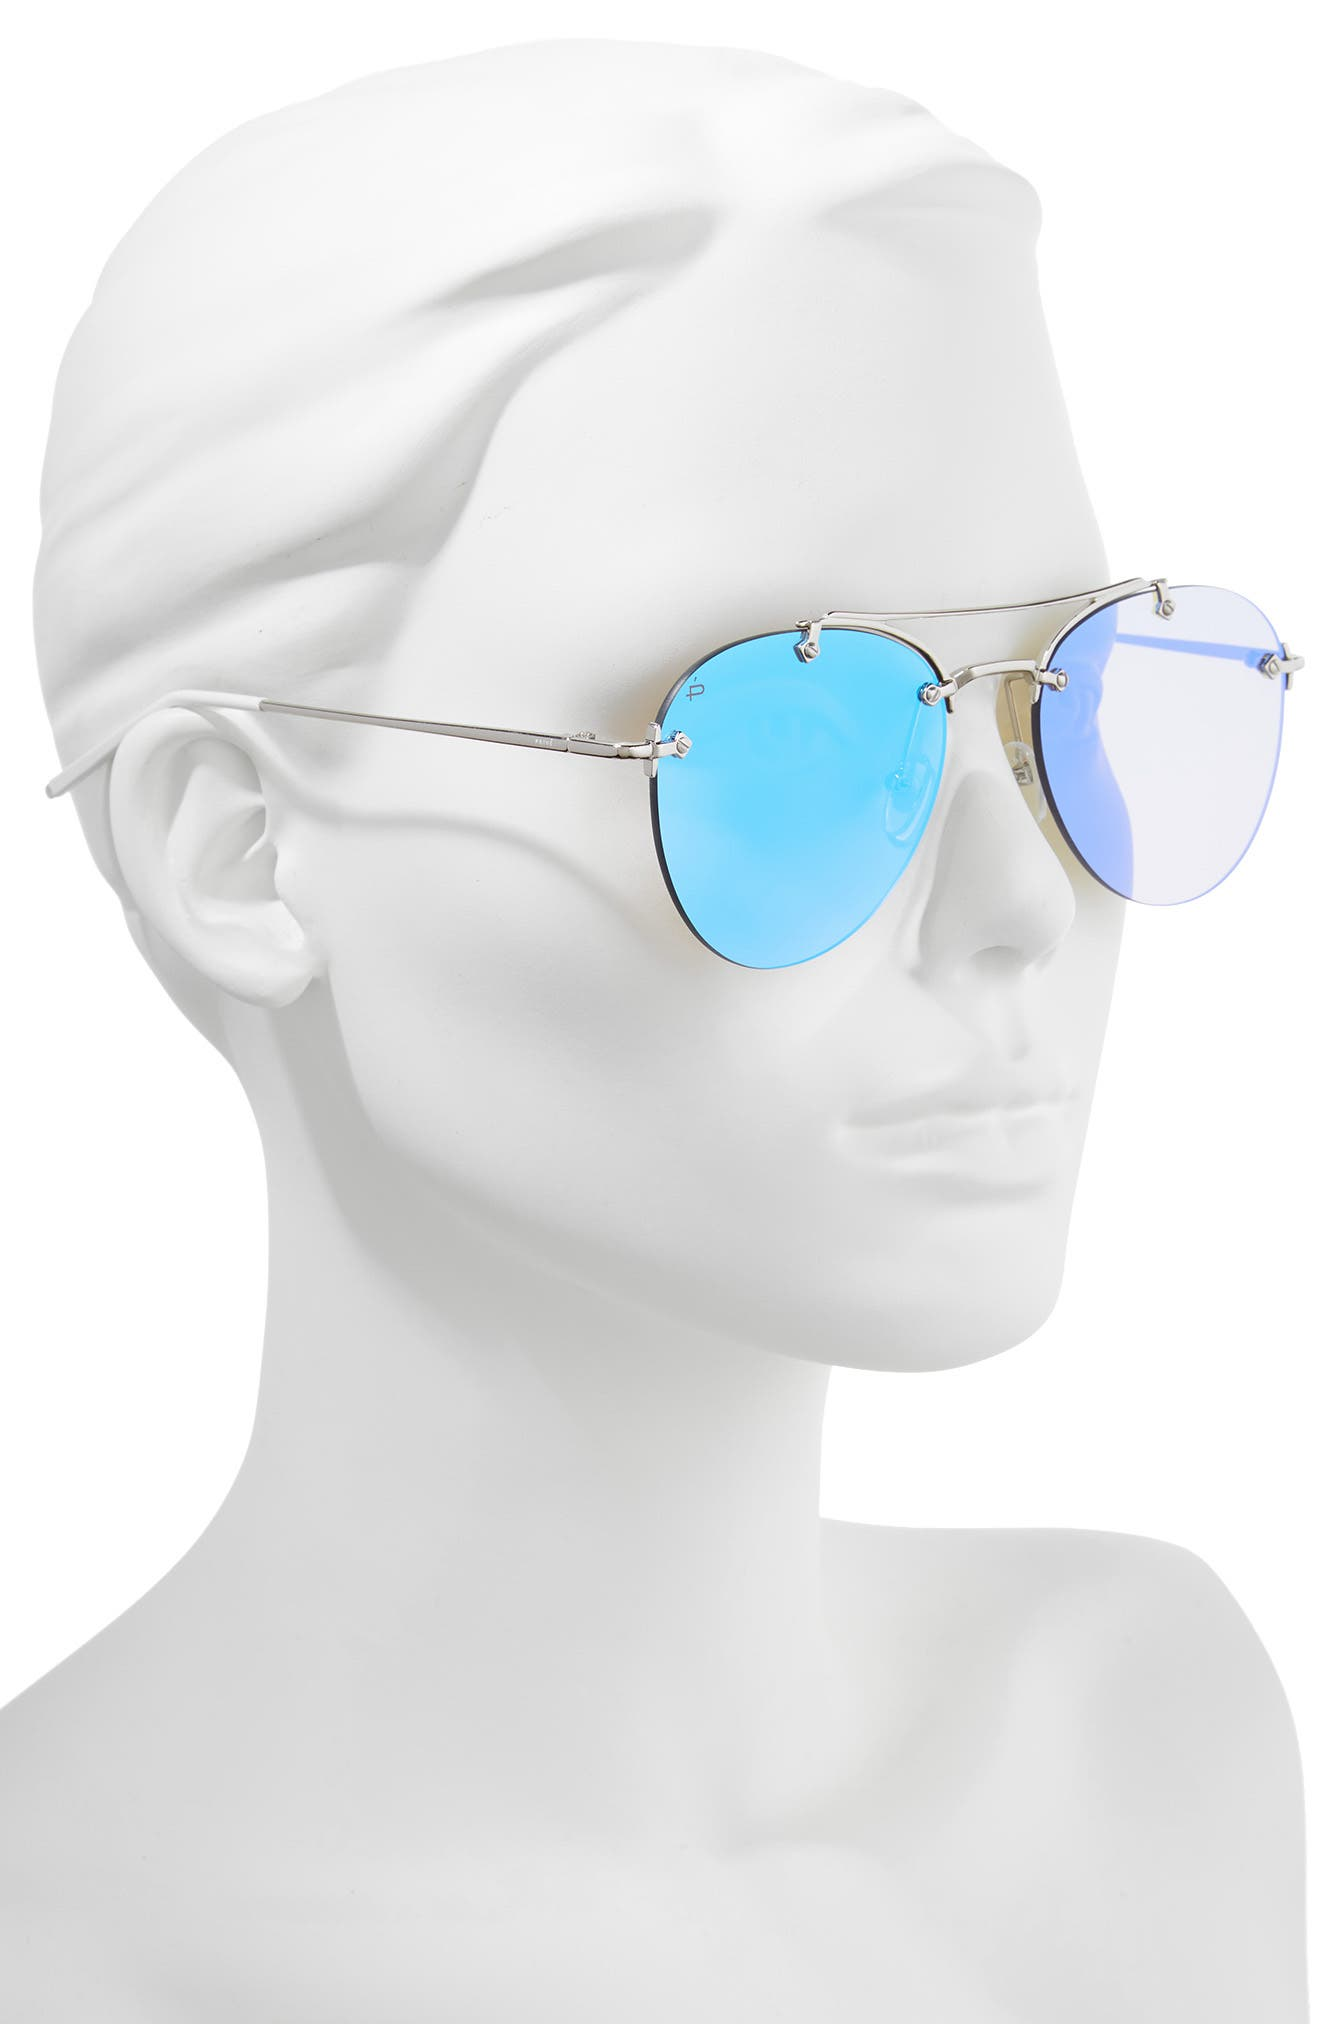 Privé Revaux The Dutchess 57mm Aviator Sunglasses,                             Alternate thumbnail 2, color,                             040